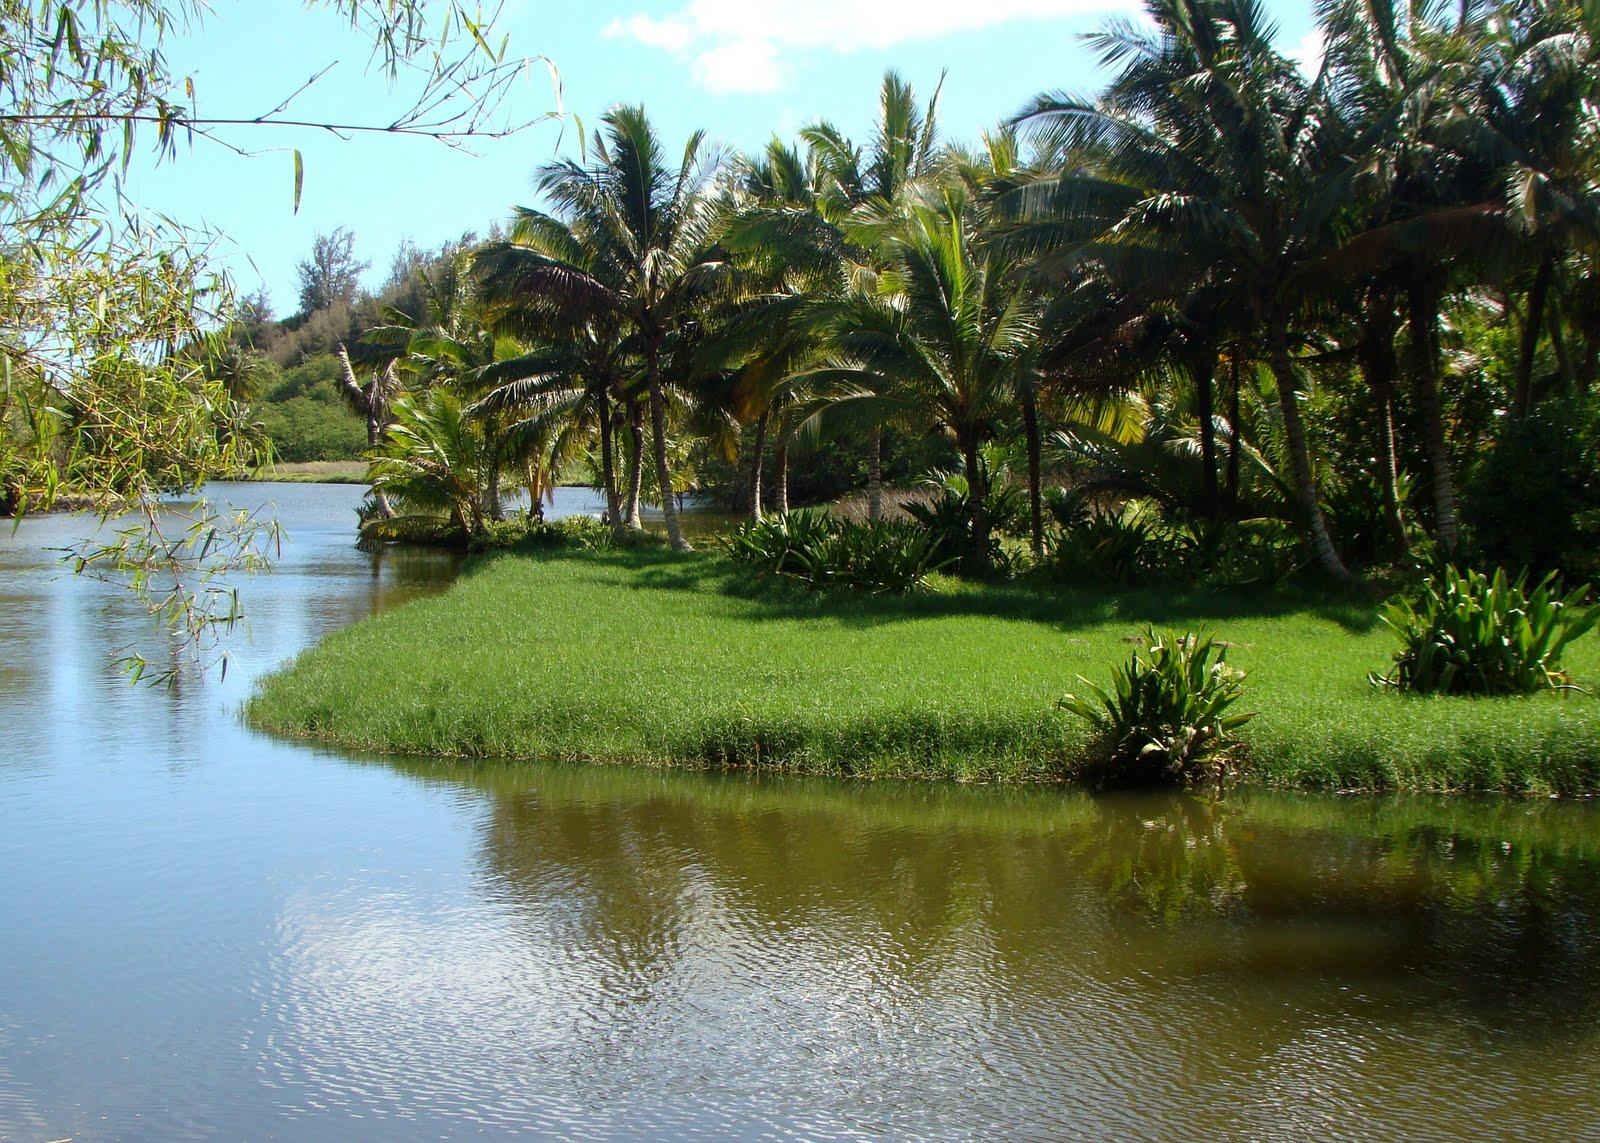 National tropical botanical garden kauai - National tropical botanical garden ...